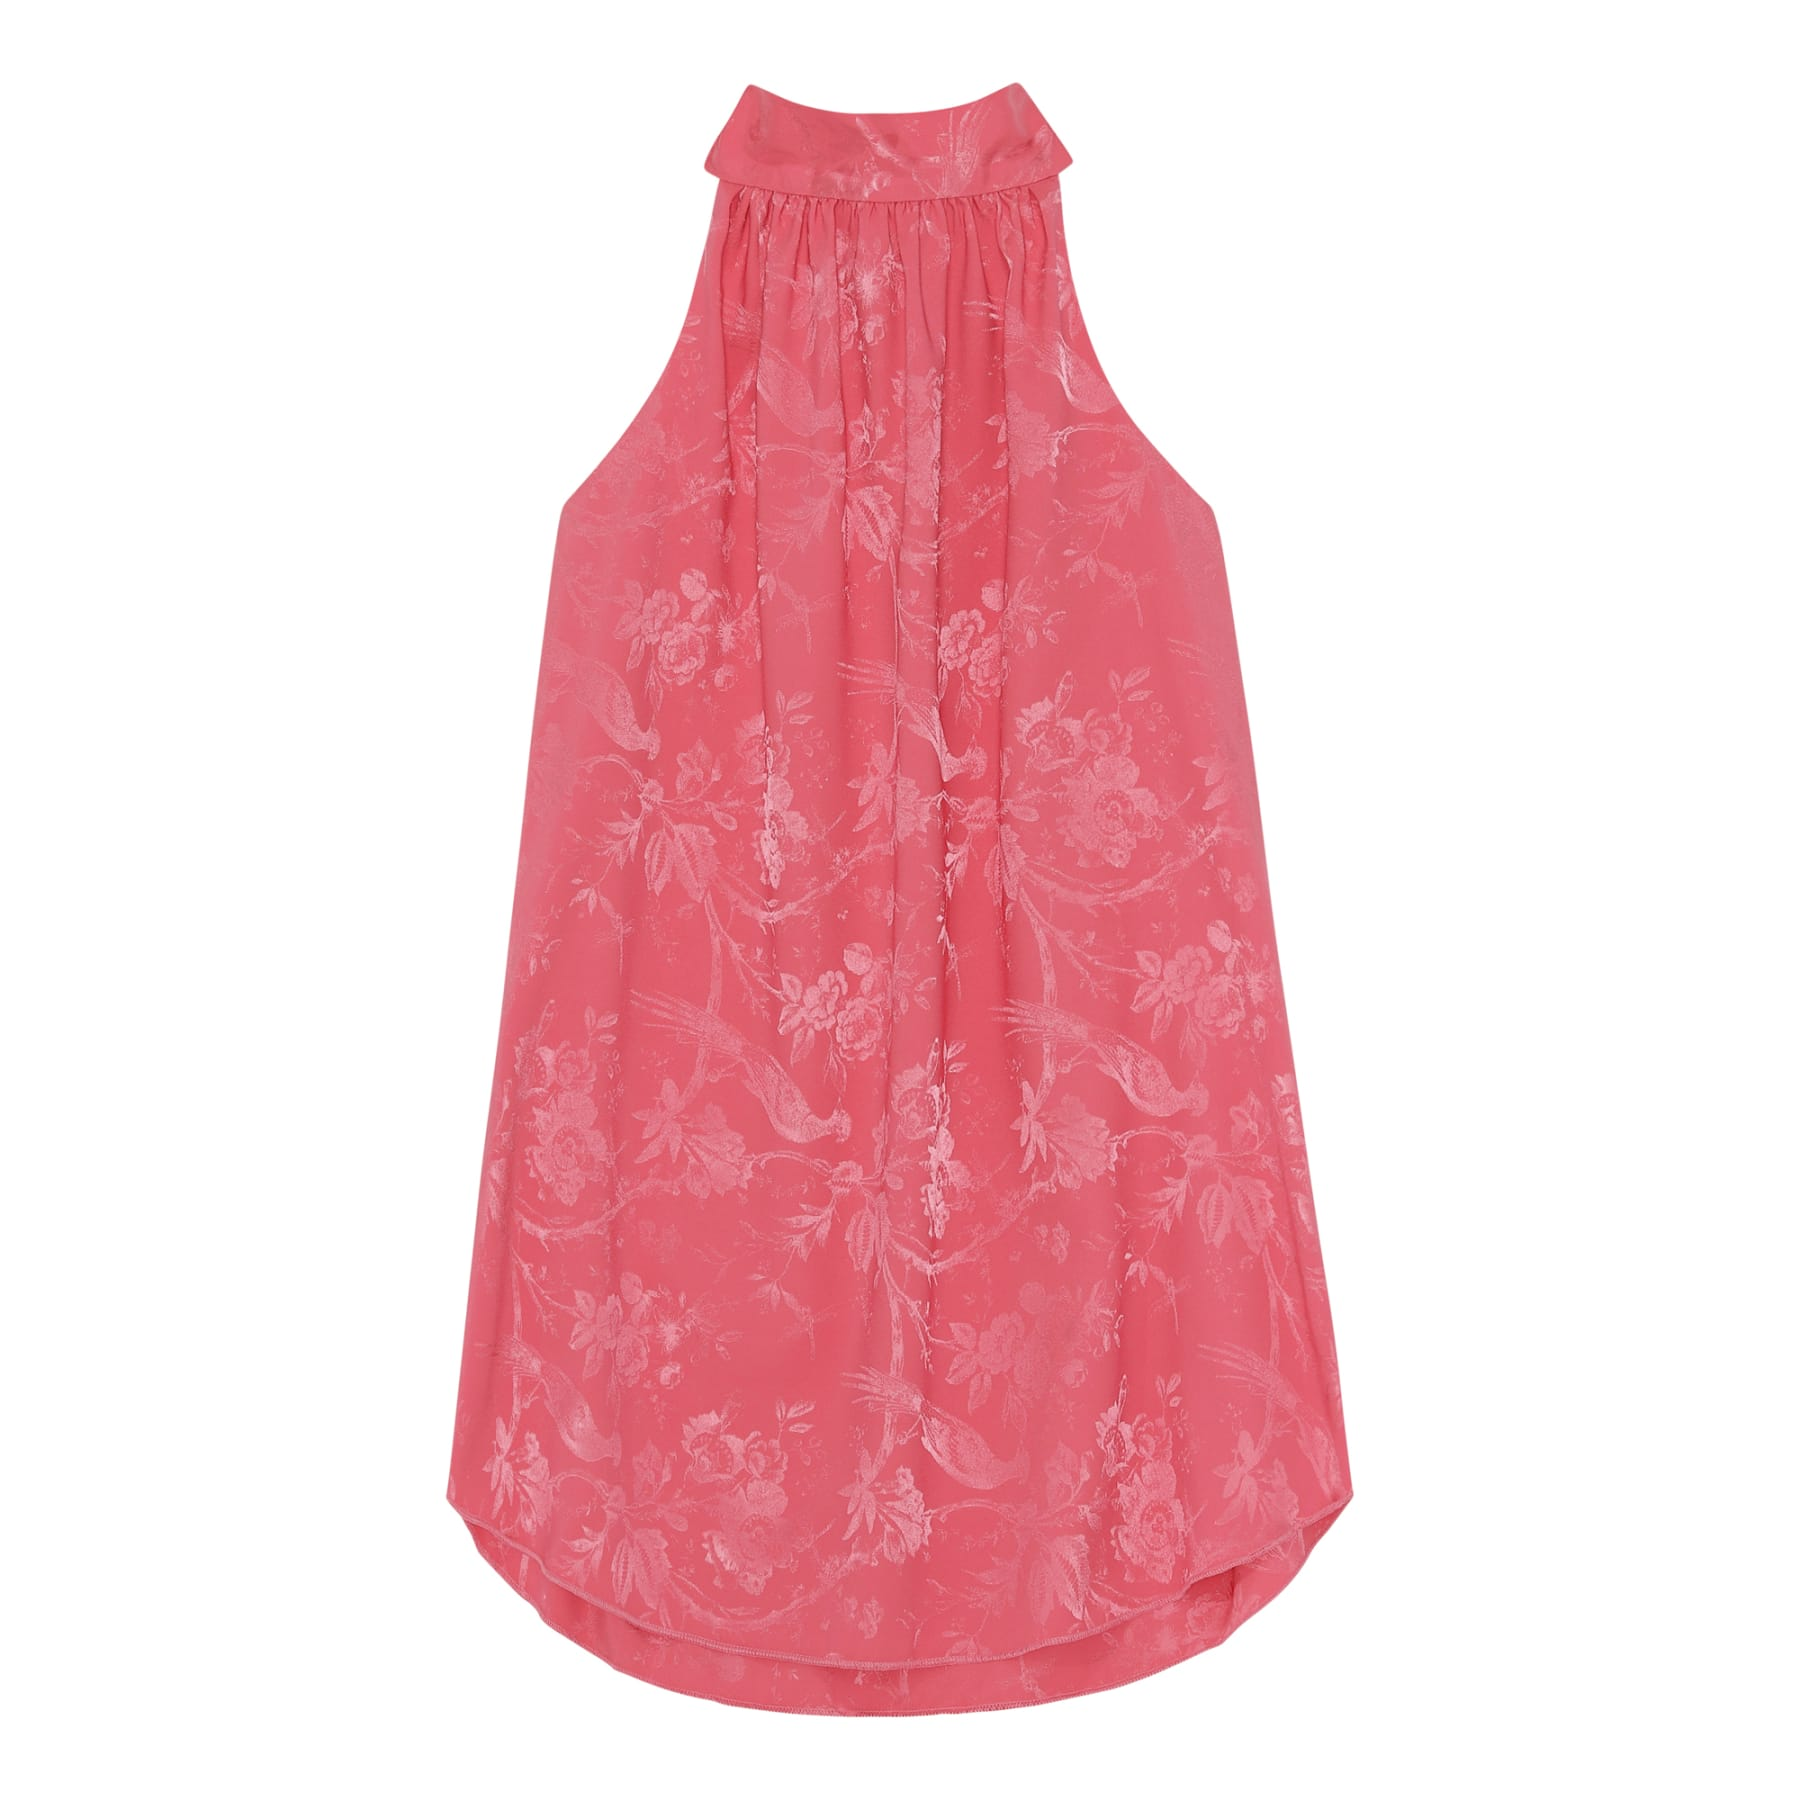 Eloise Top - Provence Jacquard Pink